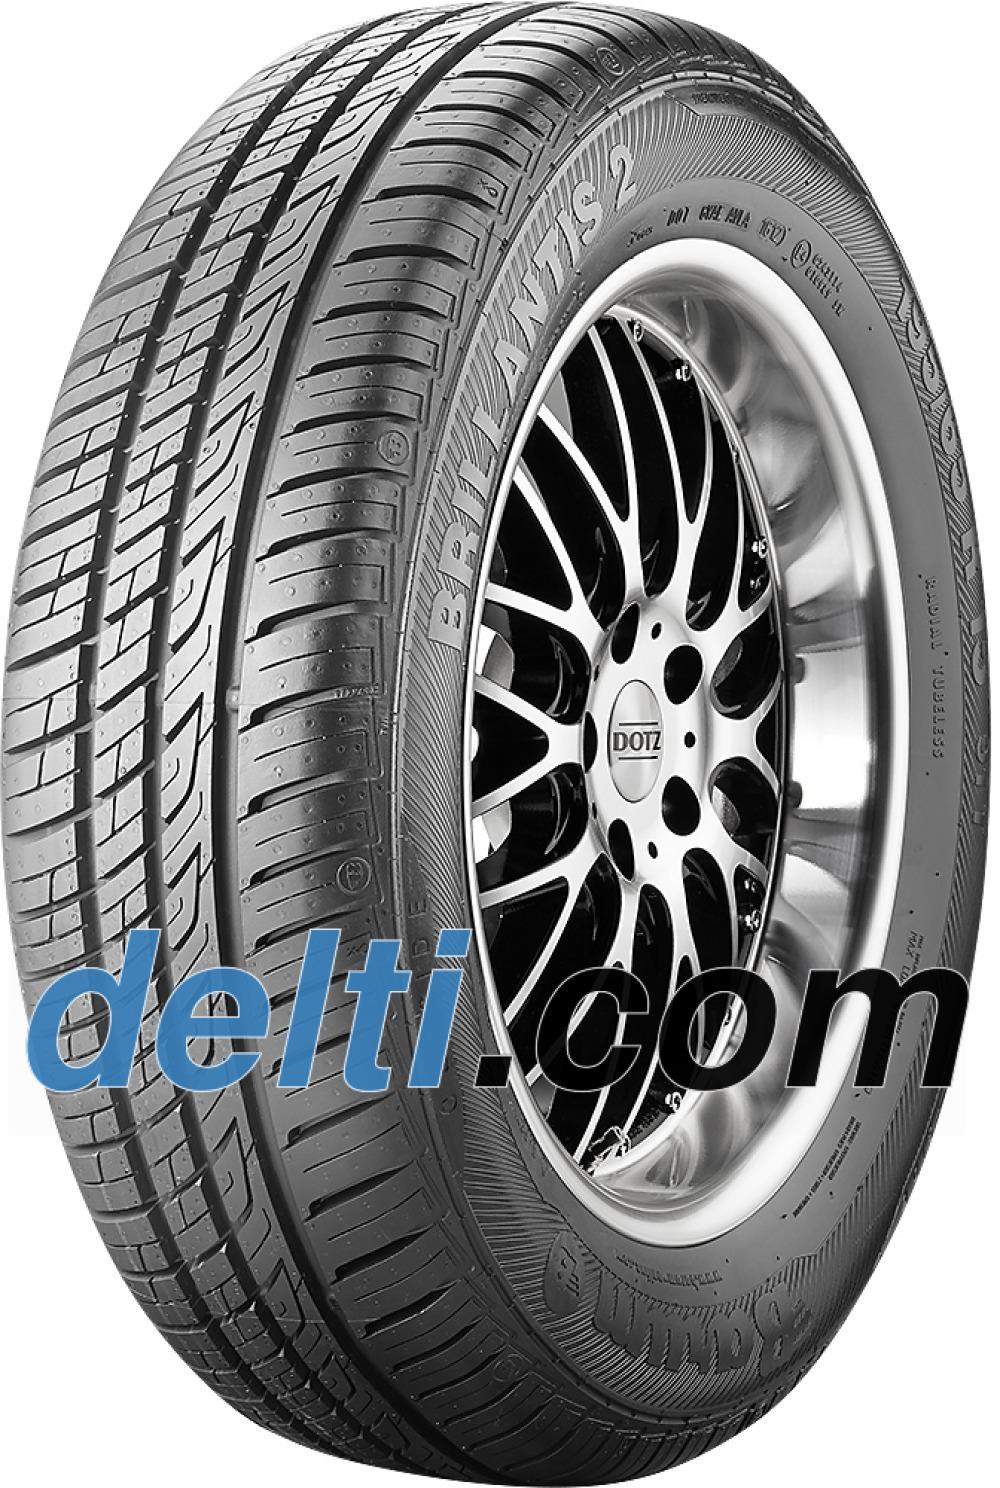 Barum Brillantis 2 ( 265/70 R15 112H SUV )